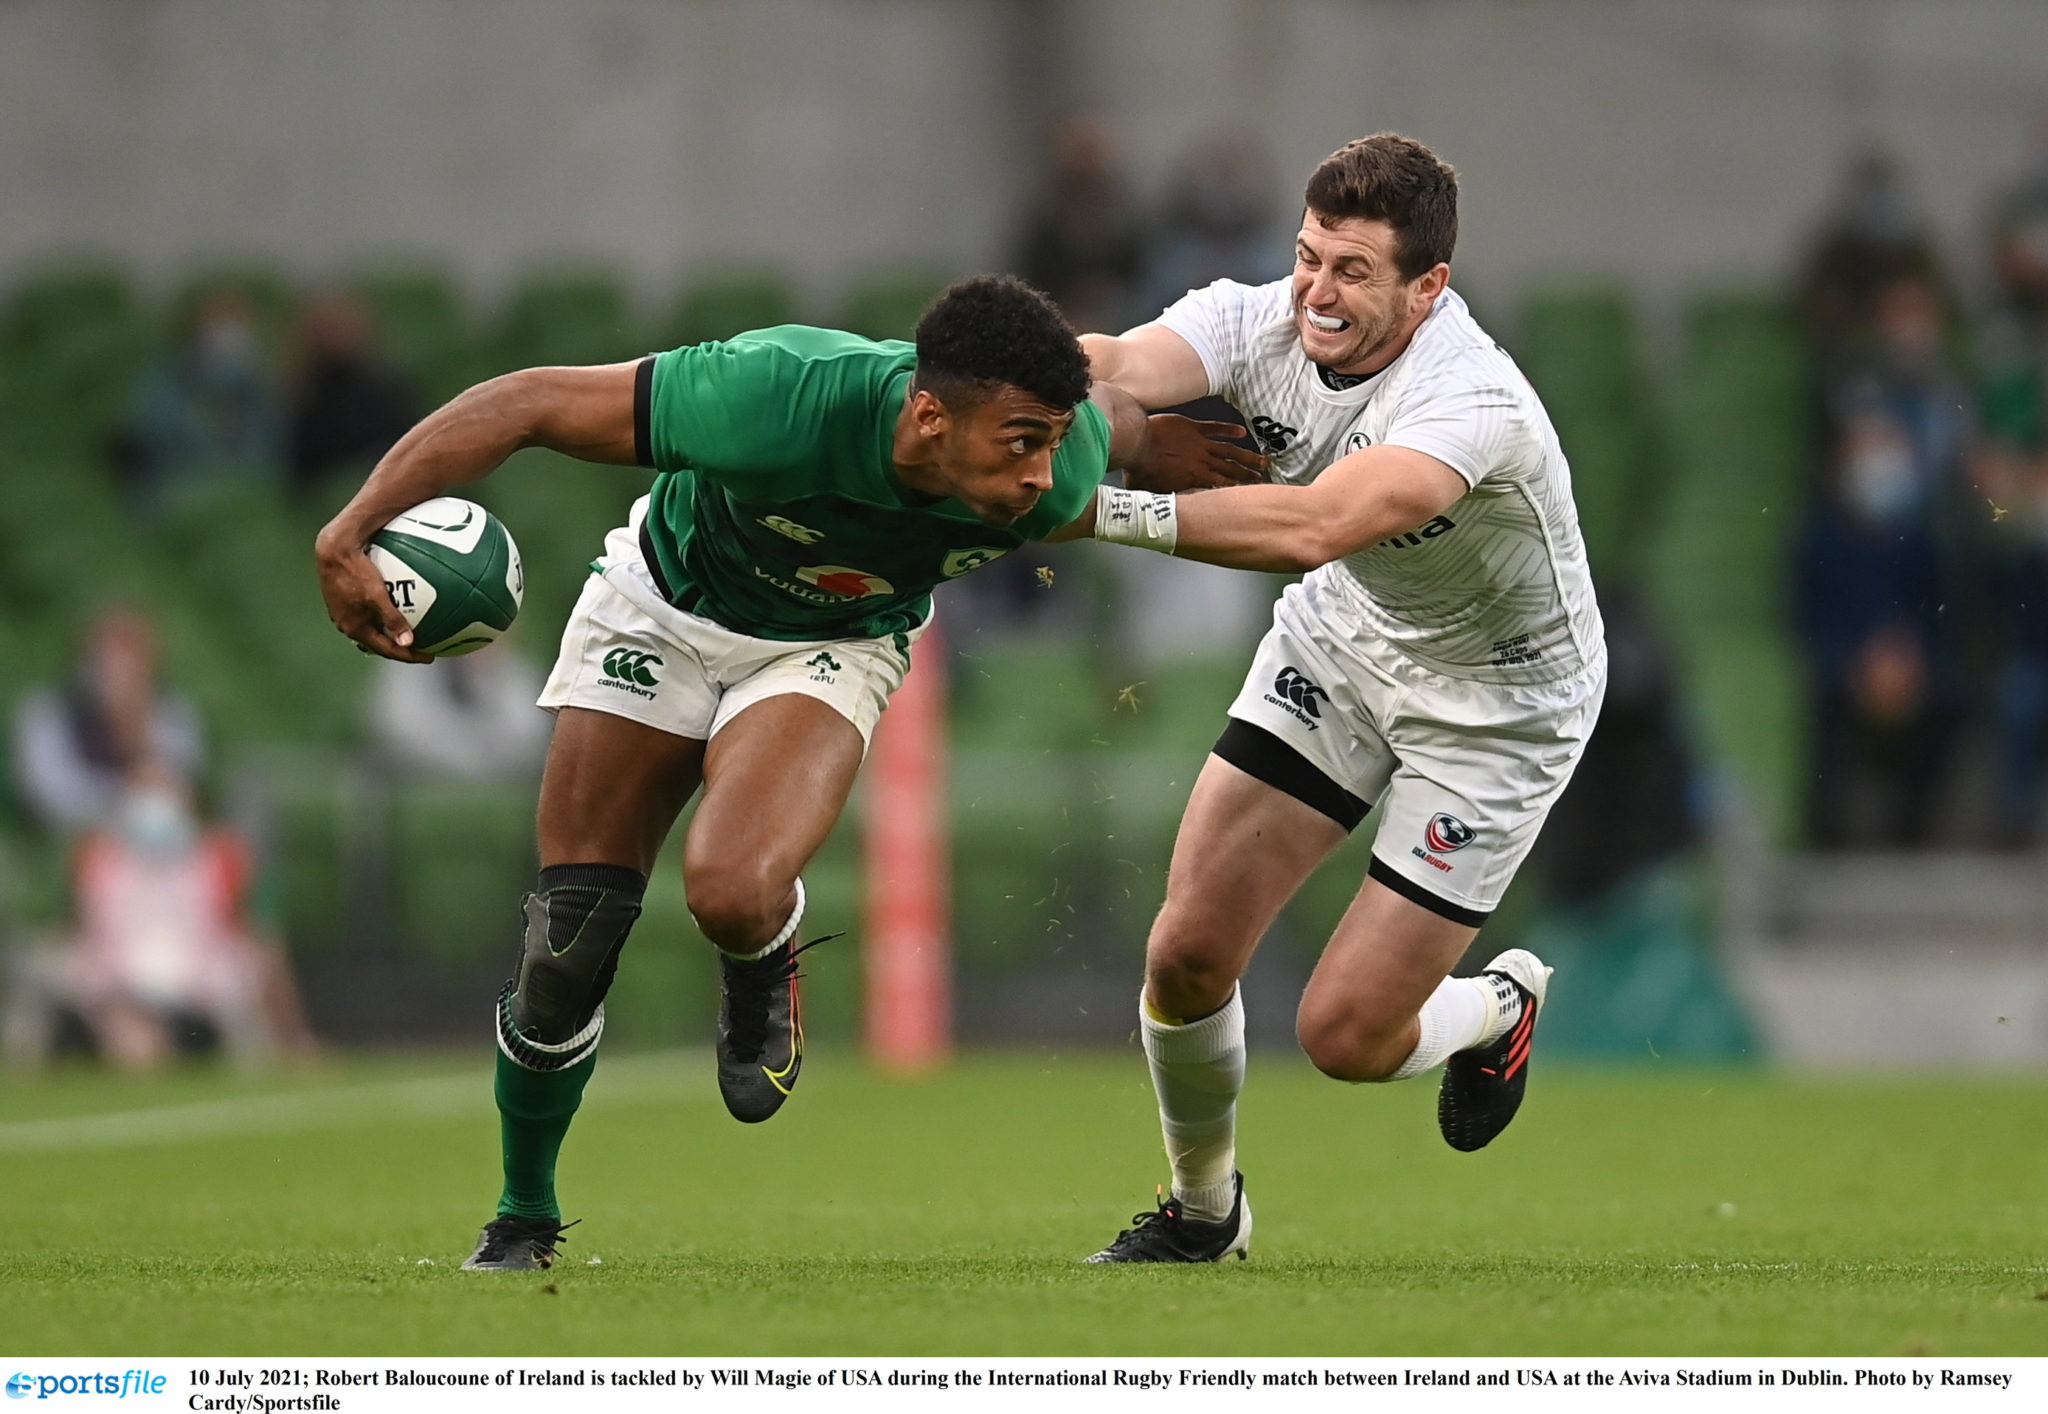 Robert Baloucoune of Ireland drives with the ball